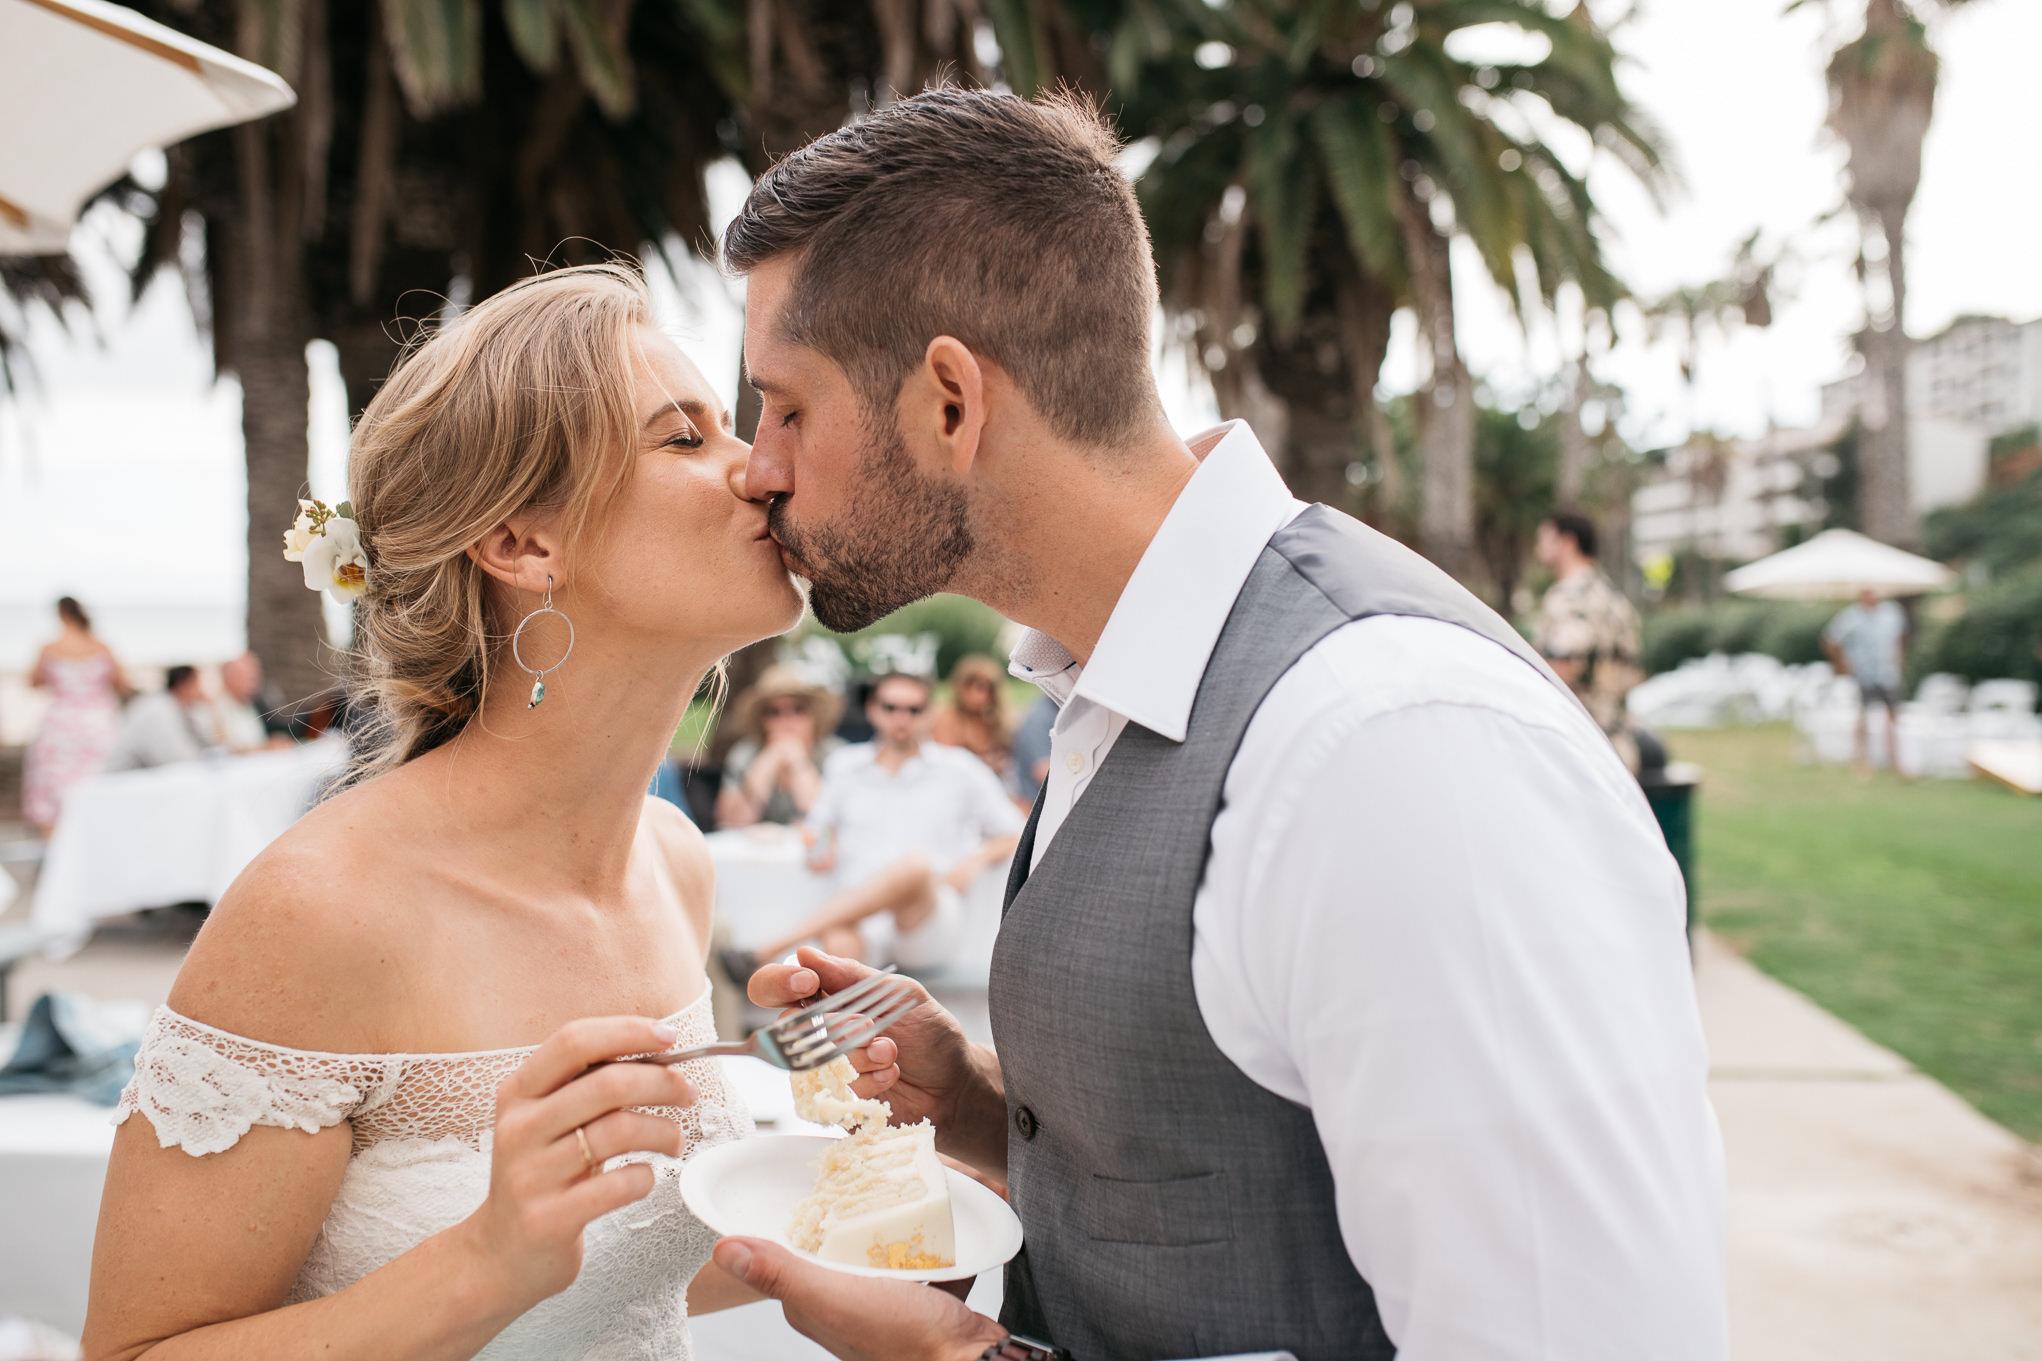 502_ONL_Jenny_Ken_Wedding_Trevor_Hooper_Photo.jpg